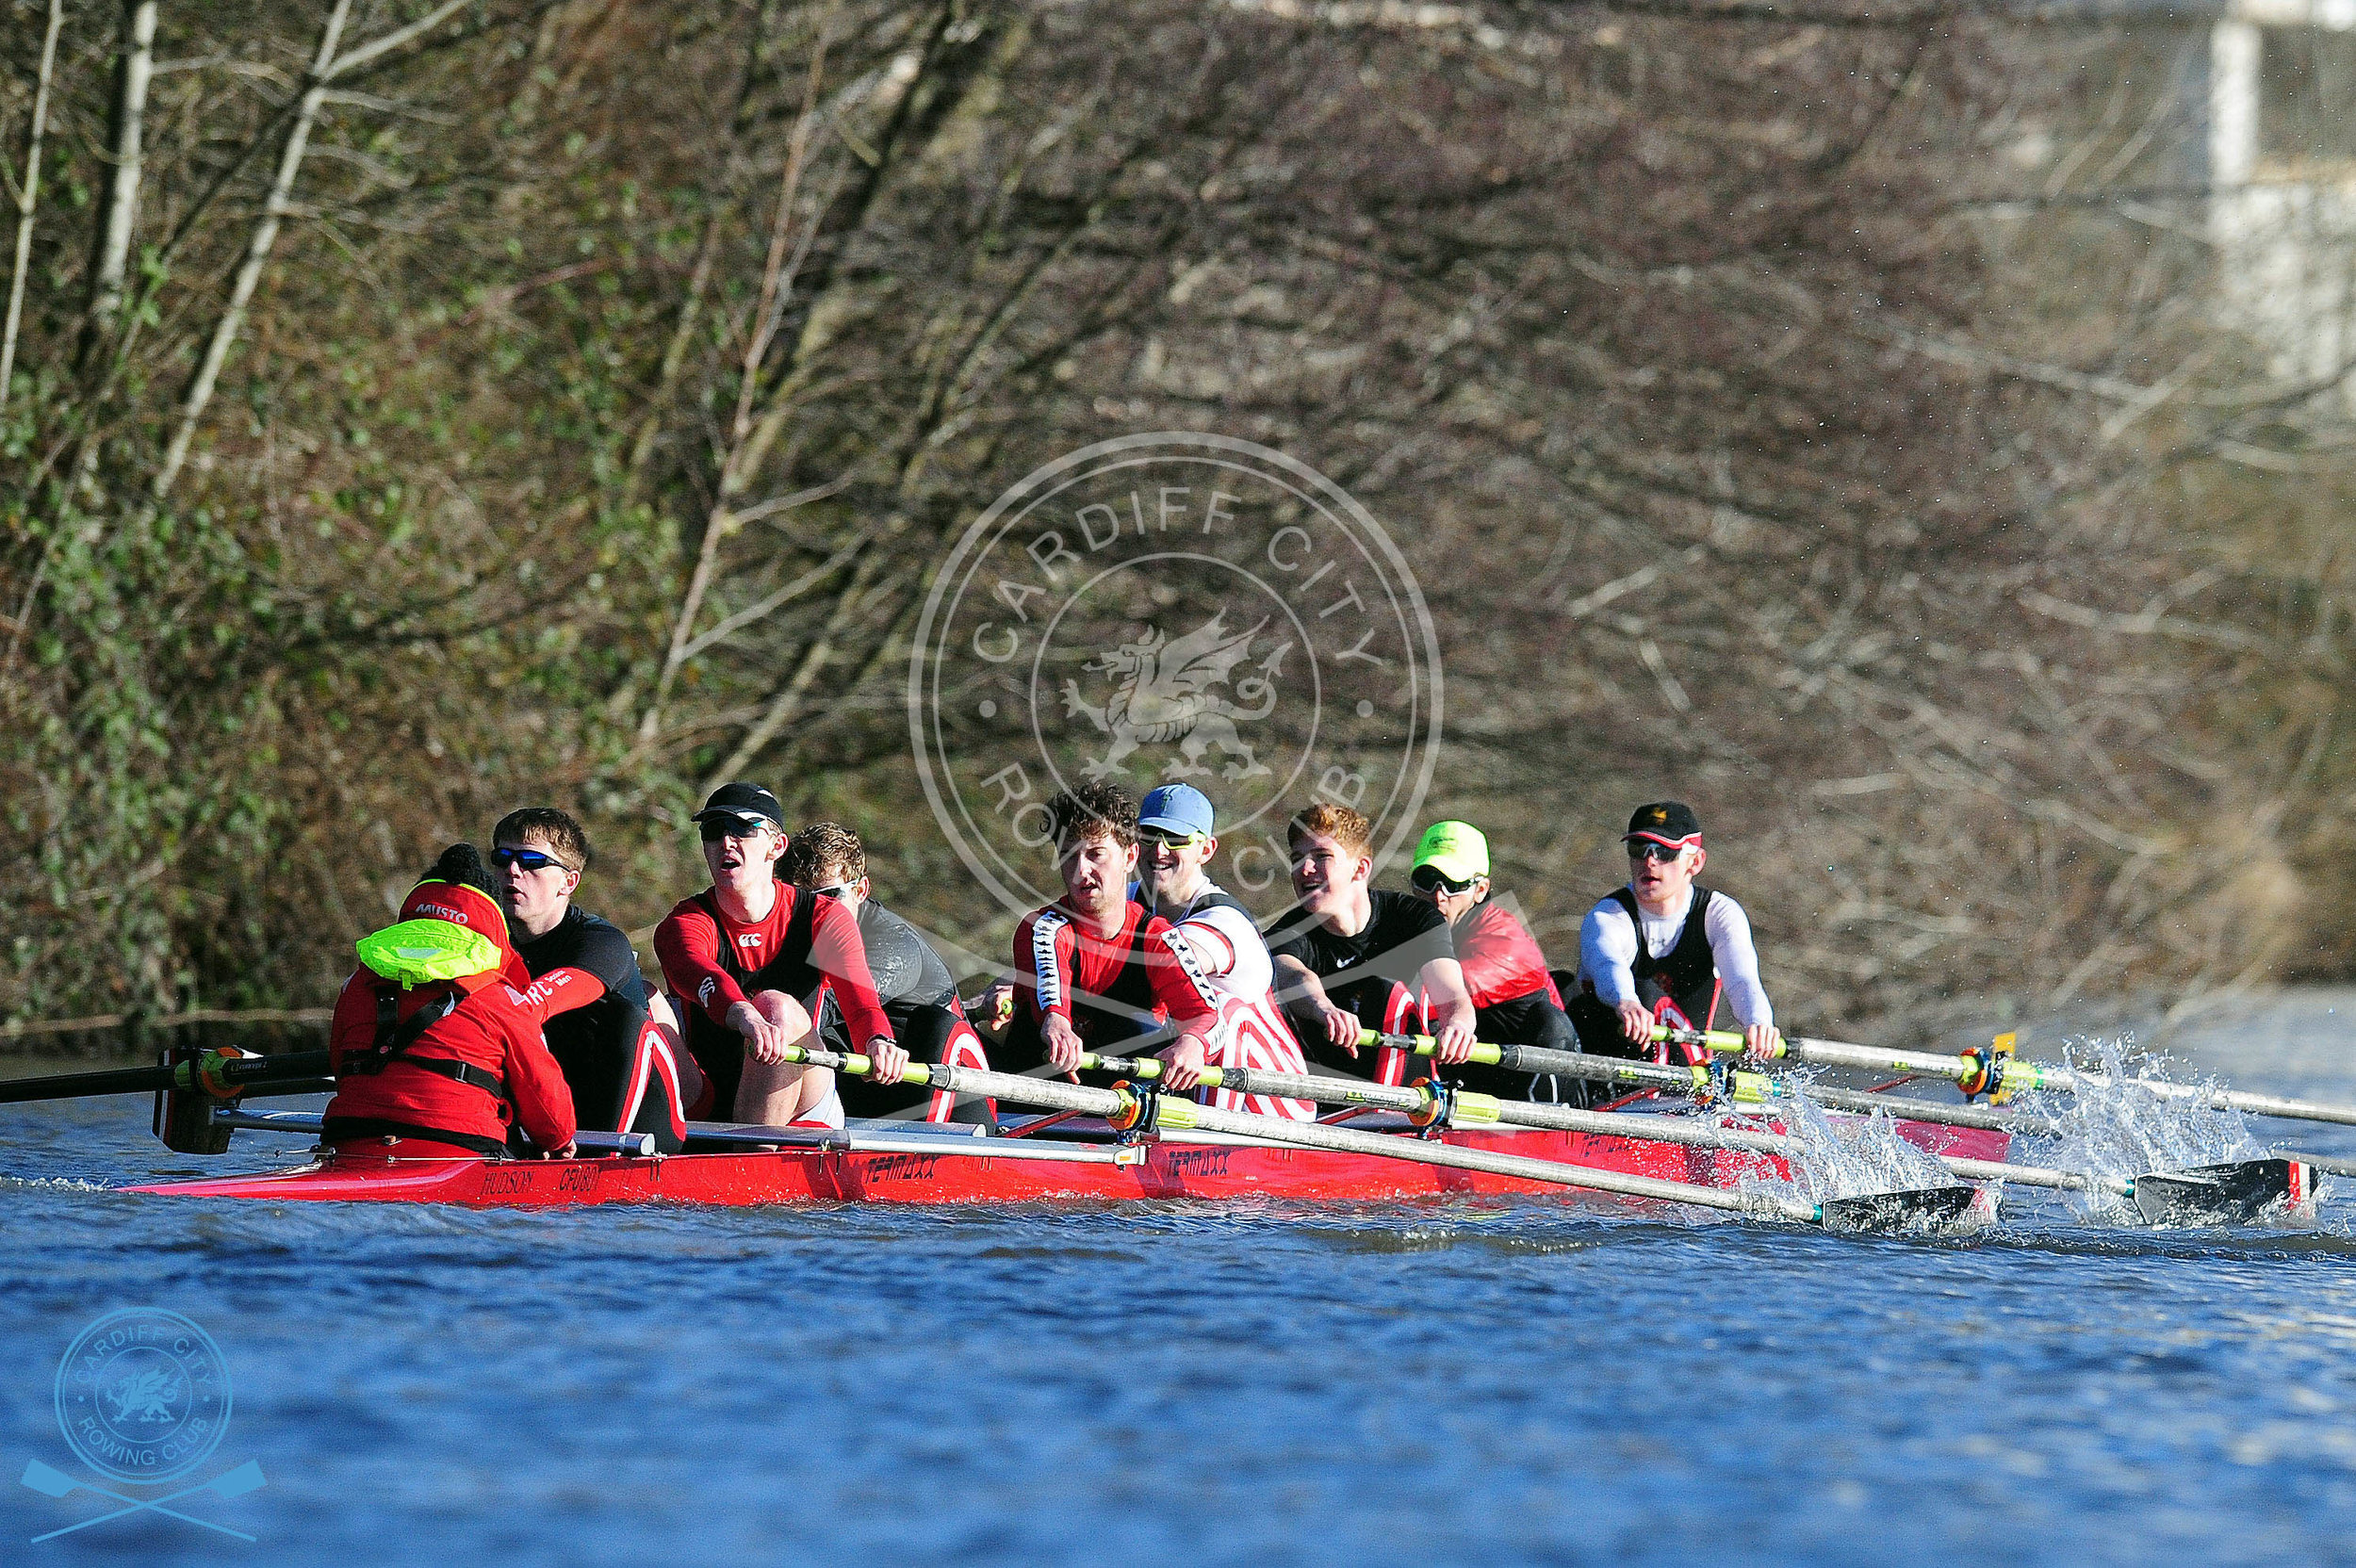 DW_280119_Cardiff_City_Rowing_232.jpg